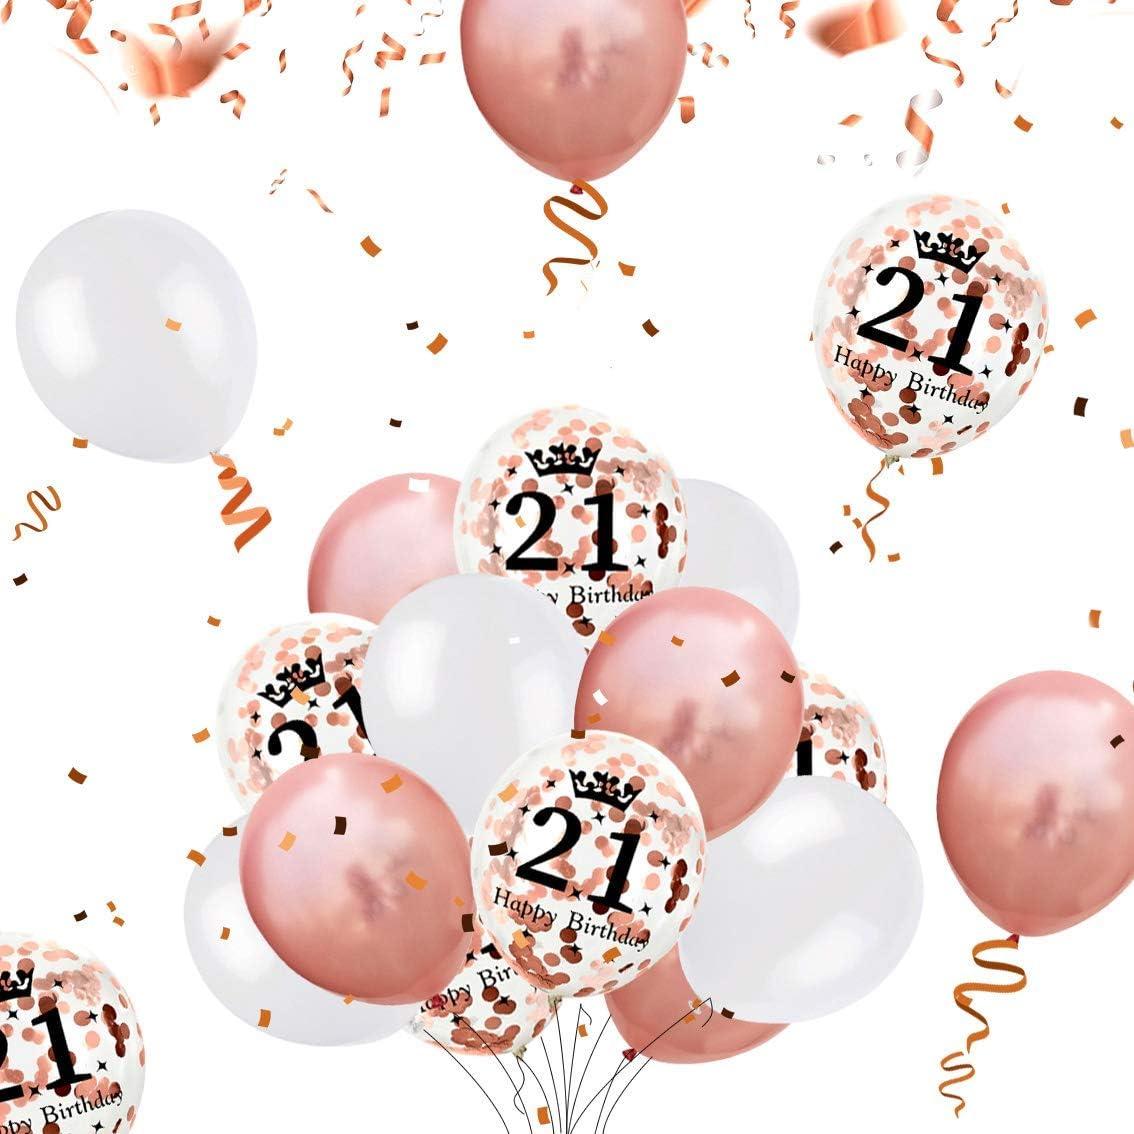 18 50 40 Geburtstag Party Luftballon XXL Zahlen Happy Birthday Folienballon Girlande 24 Konfetti Ballons 2 Glitzer Vorhang 10g Konfetti 30 iZoeL Rosegold 18 21